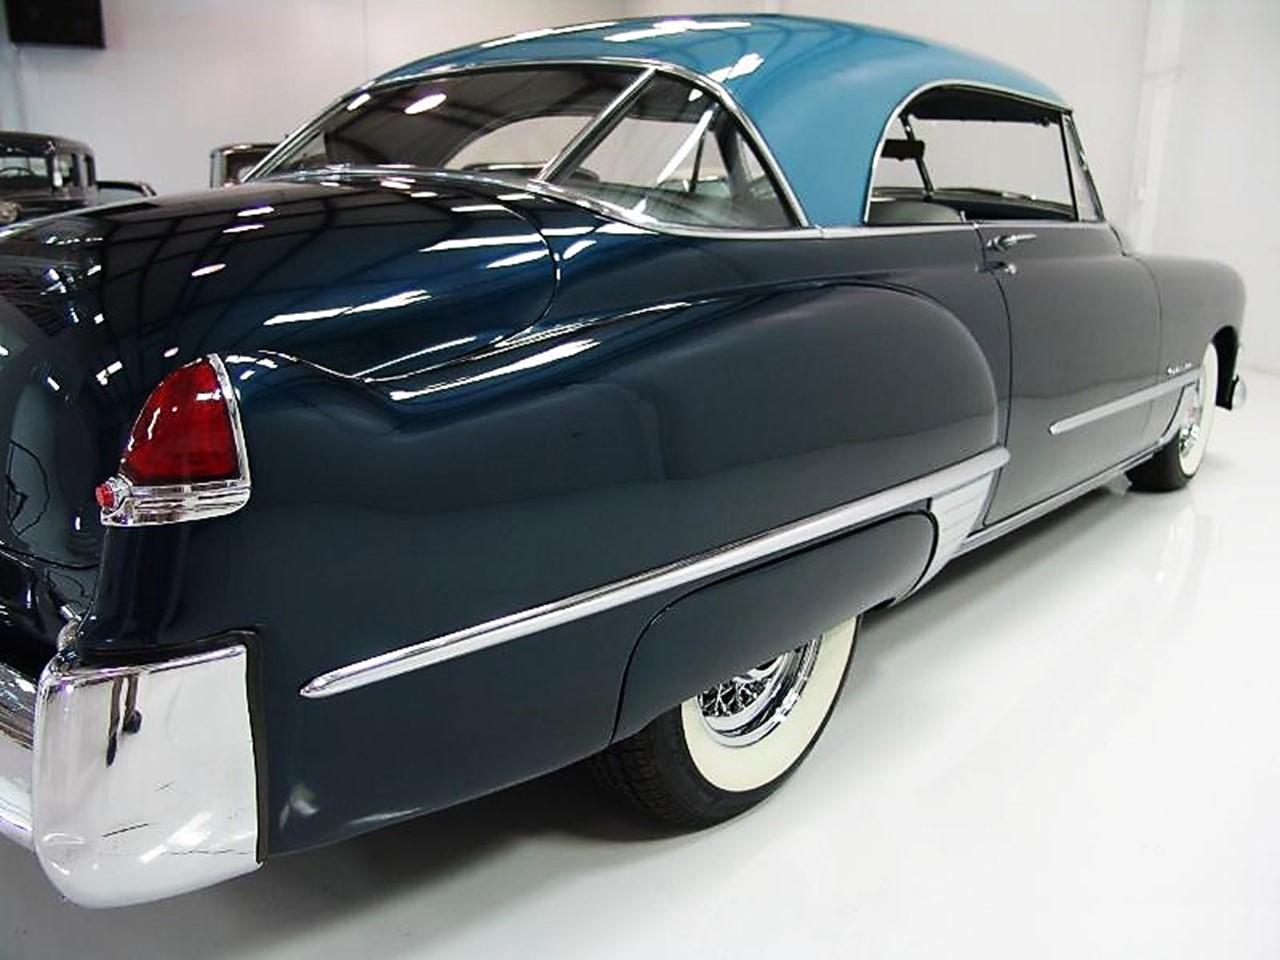 1949 Series 62 Coupe deVille 2